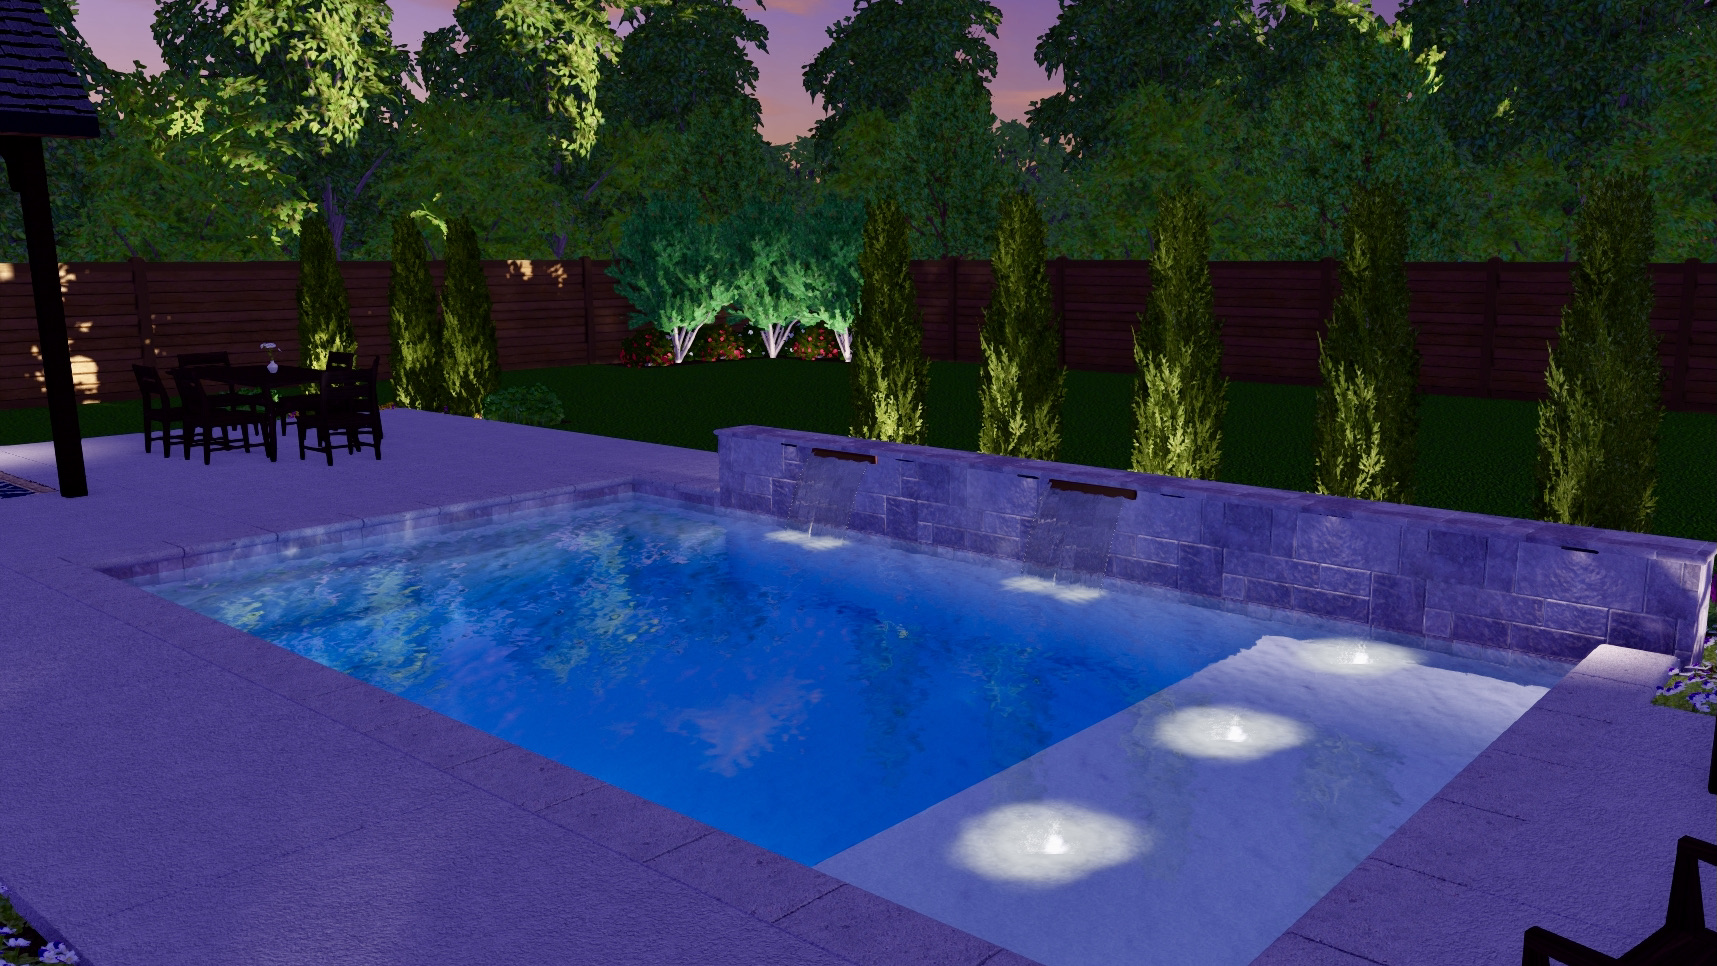 2021 04 South Tulsa Custom Gunite Pool Deck Outdoor Kitchen BF6EA179AFD7